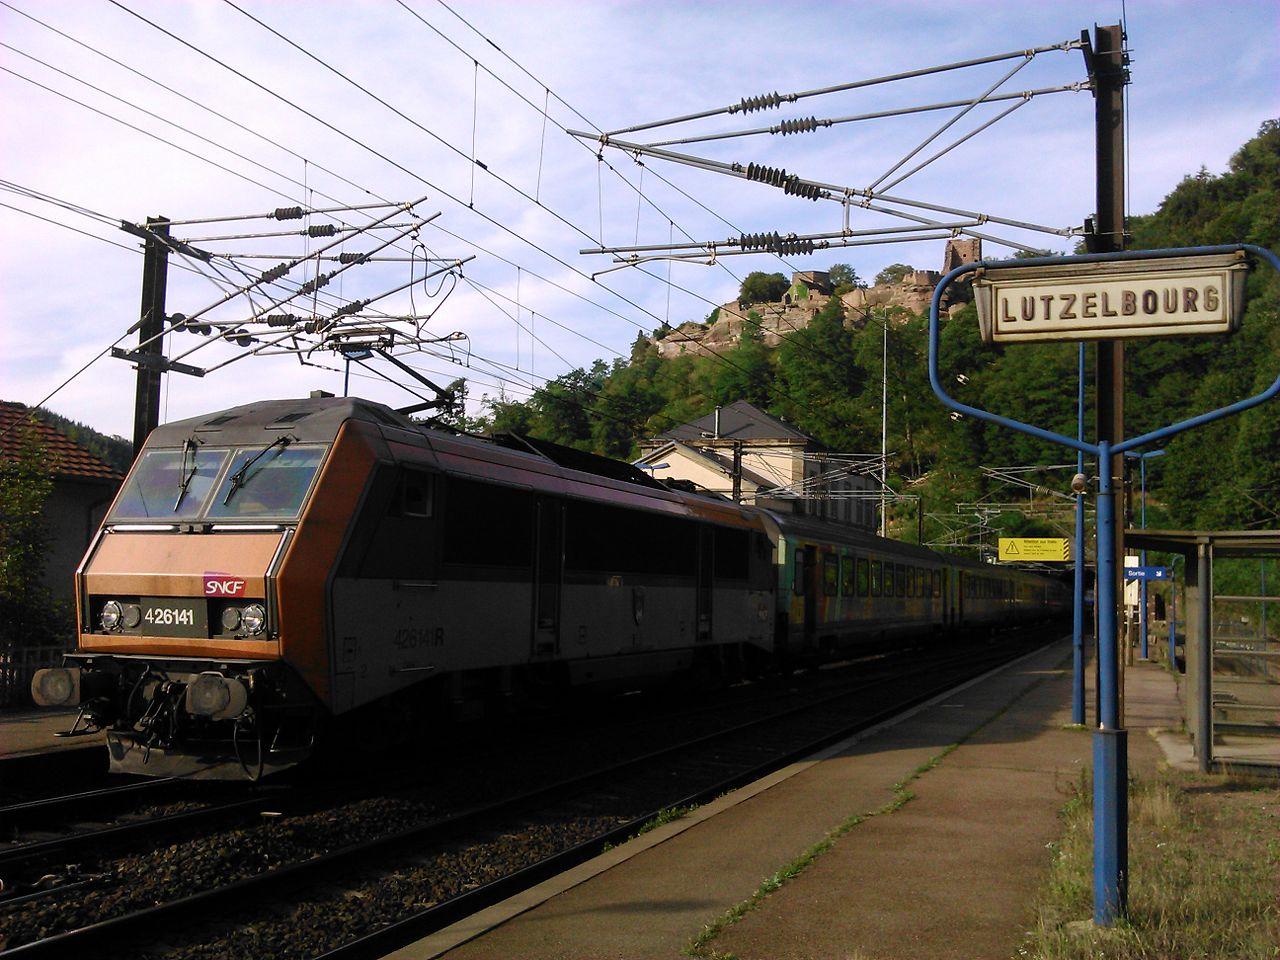 1280px-Gare_lutzelbourg_1.JPG